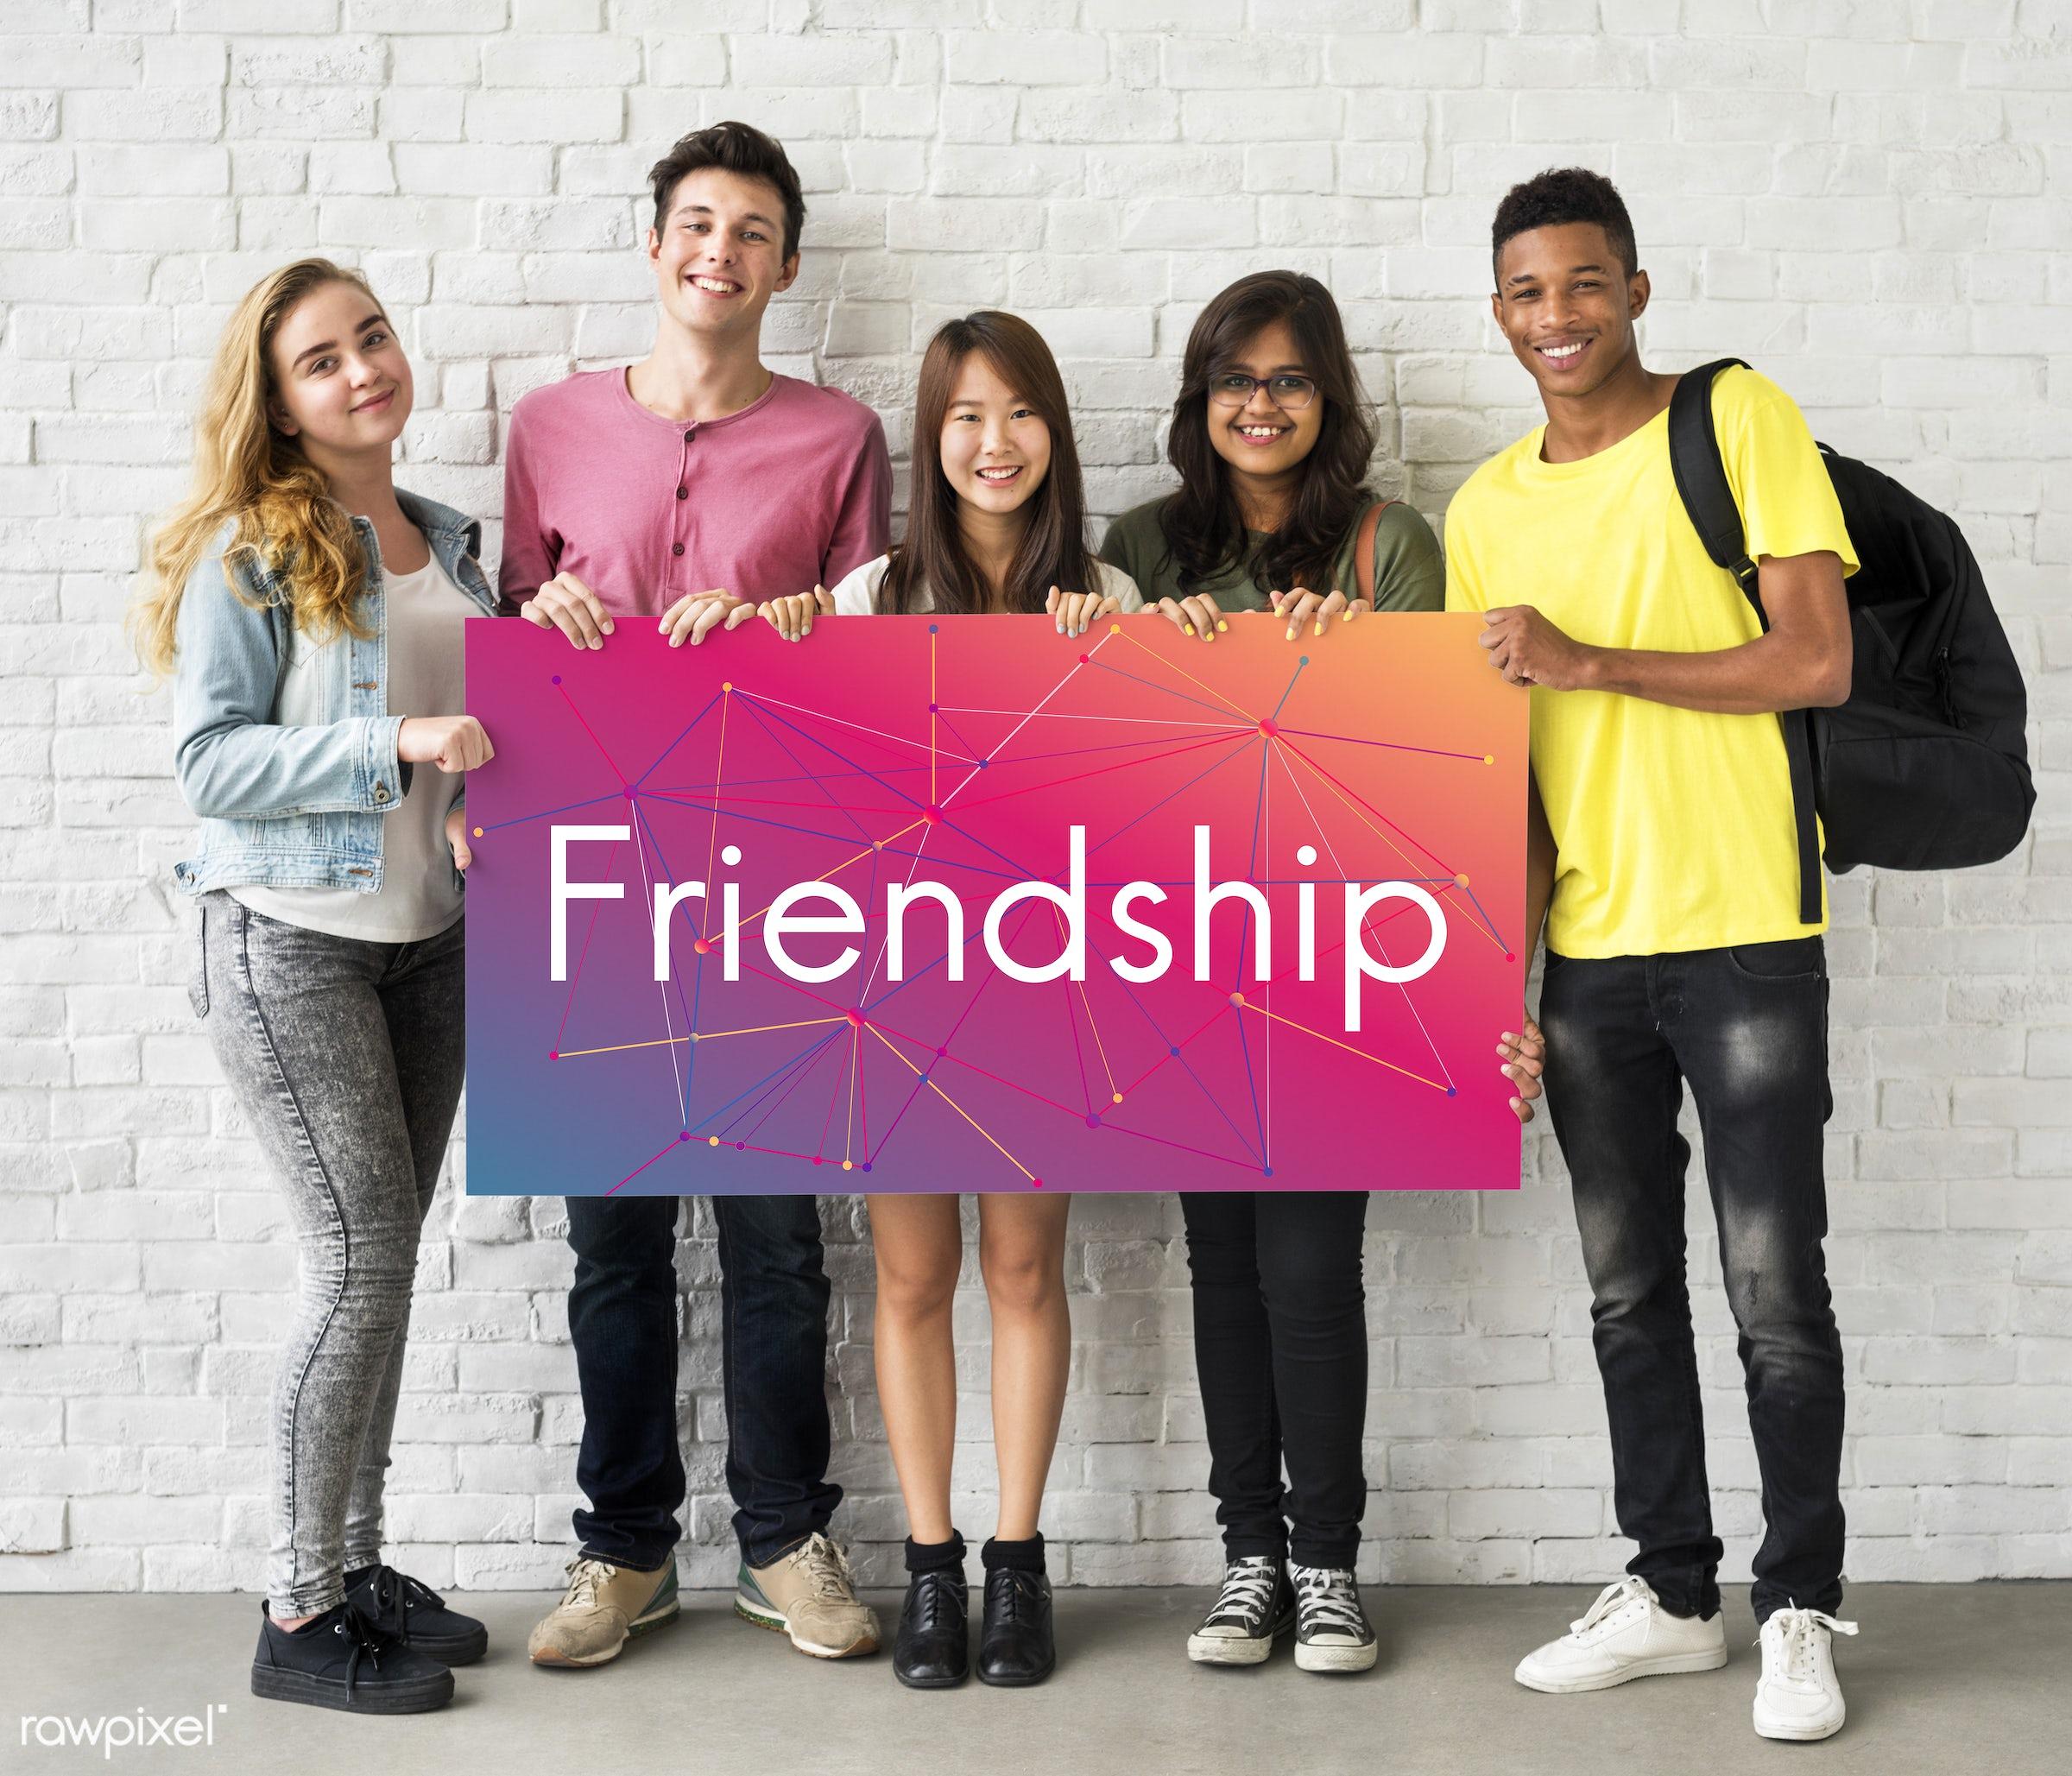 african descent, asian, caucasian, communication, community, connected, connection, culture, different, diversity, enjoyment...